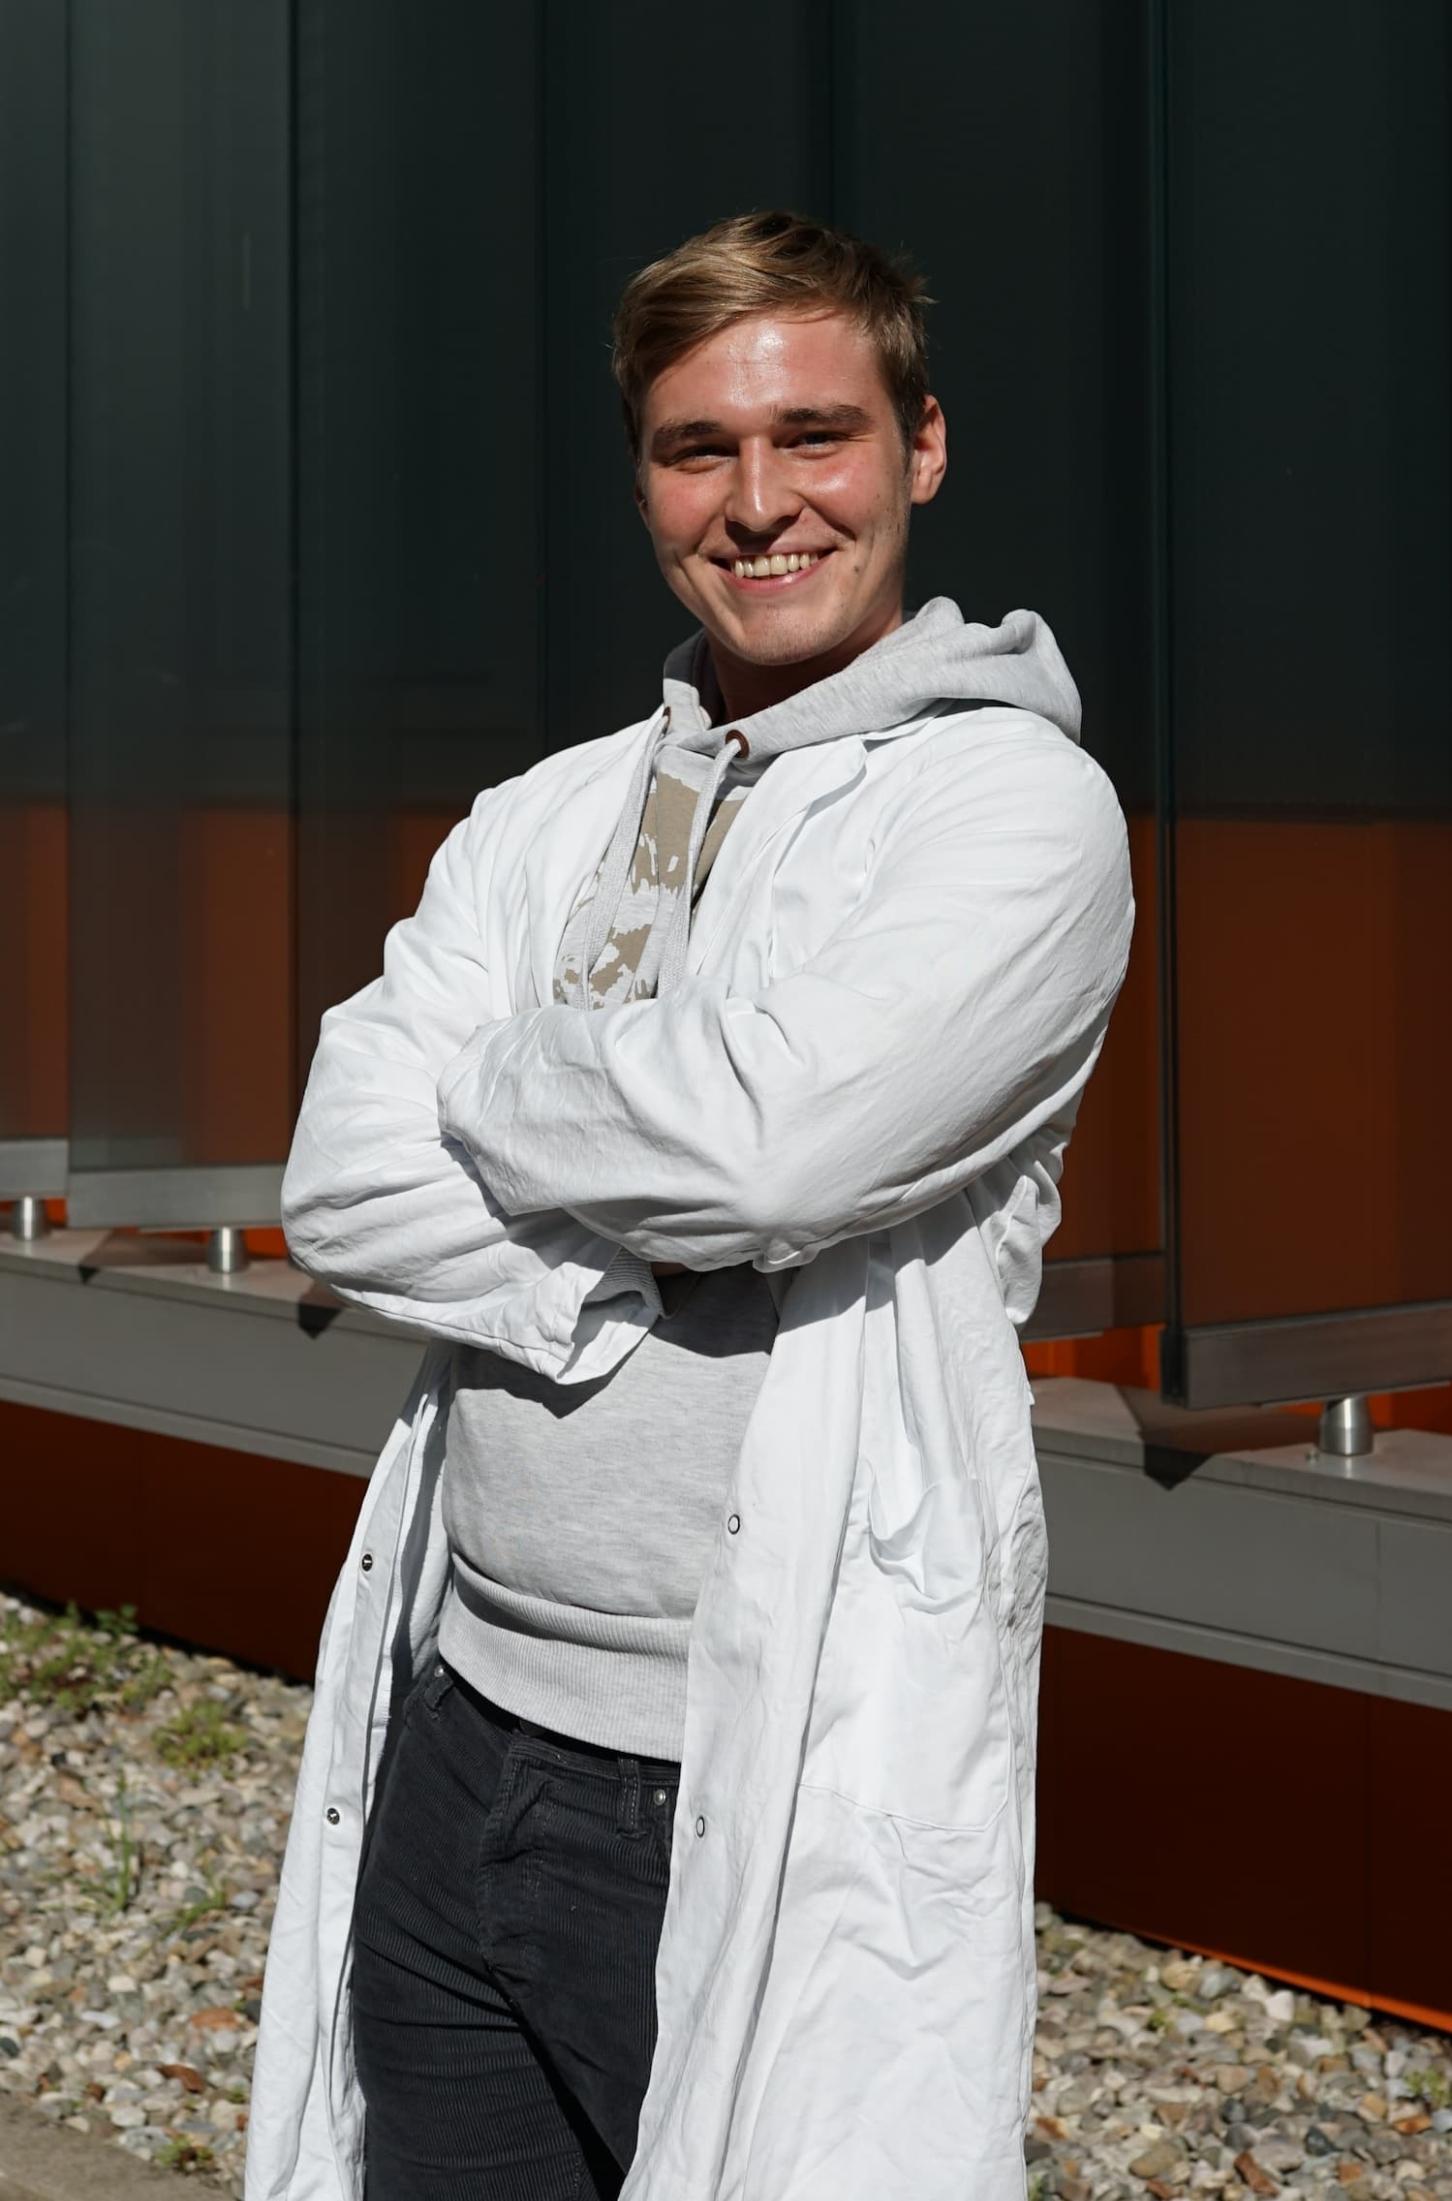 Alexander Fürlinger BSc.